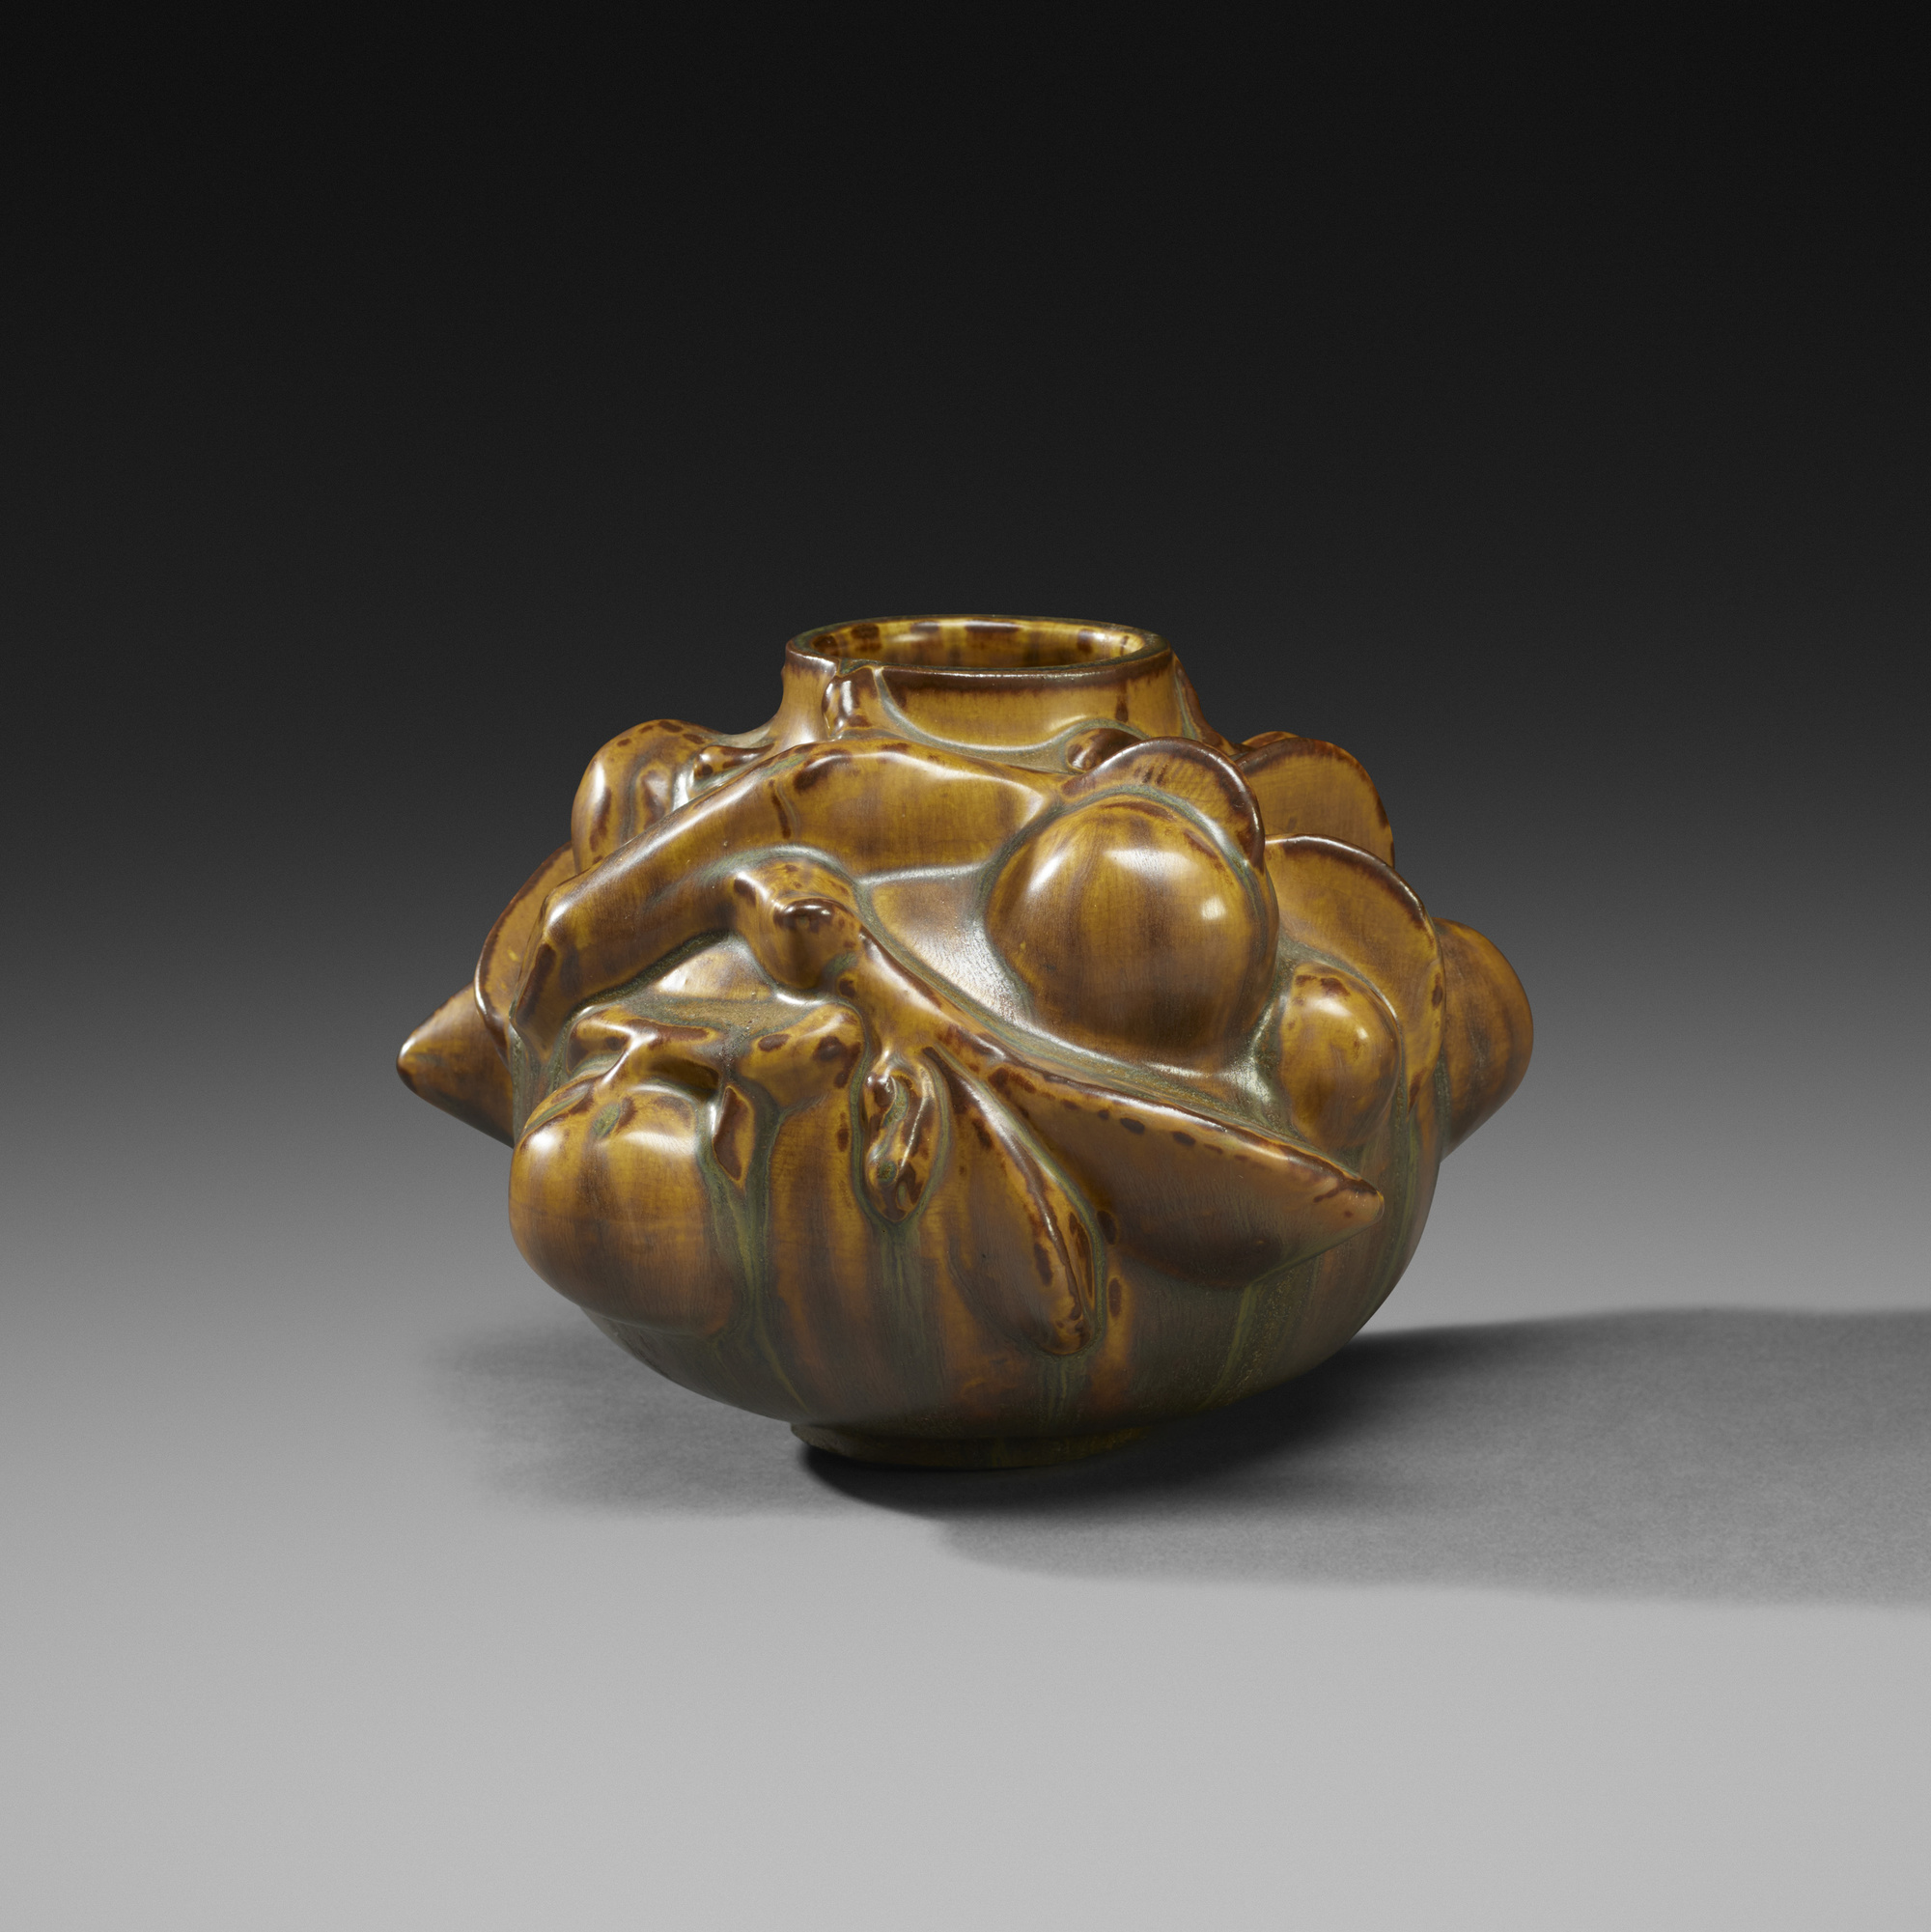 148: Axel Salto / Budding Fruits vase (1 of 3)